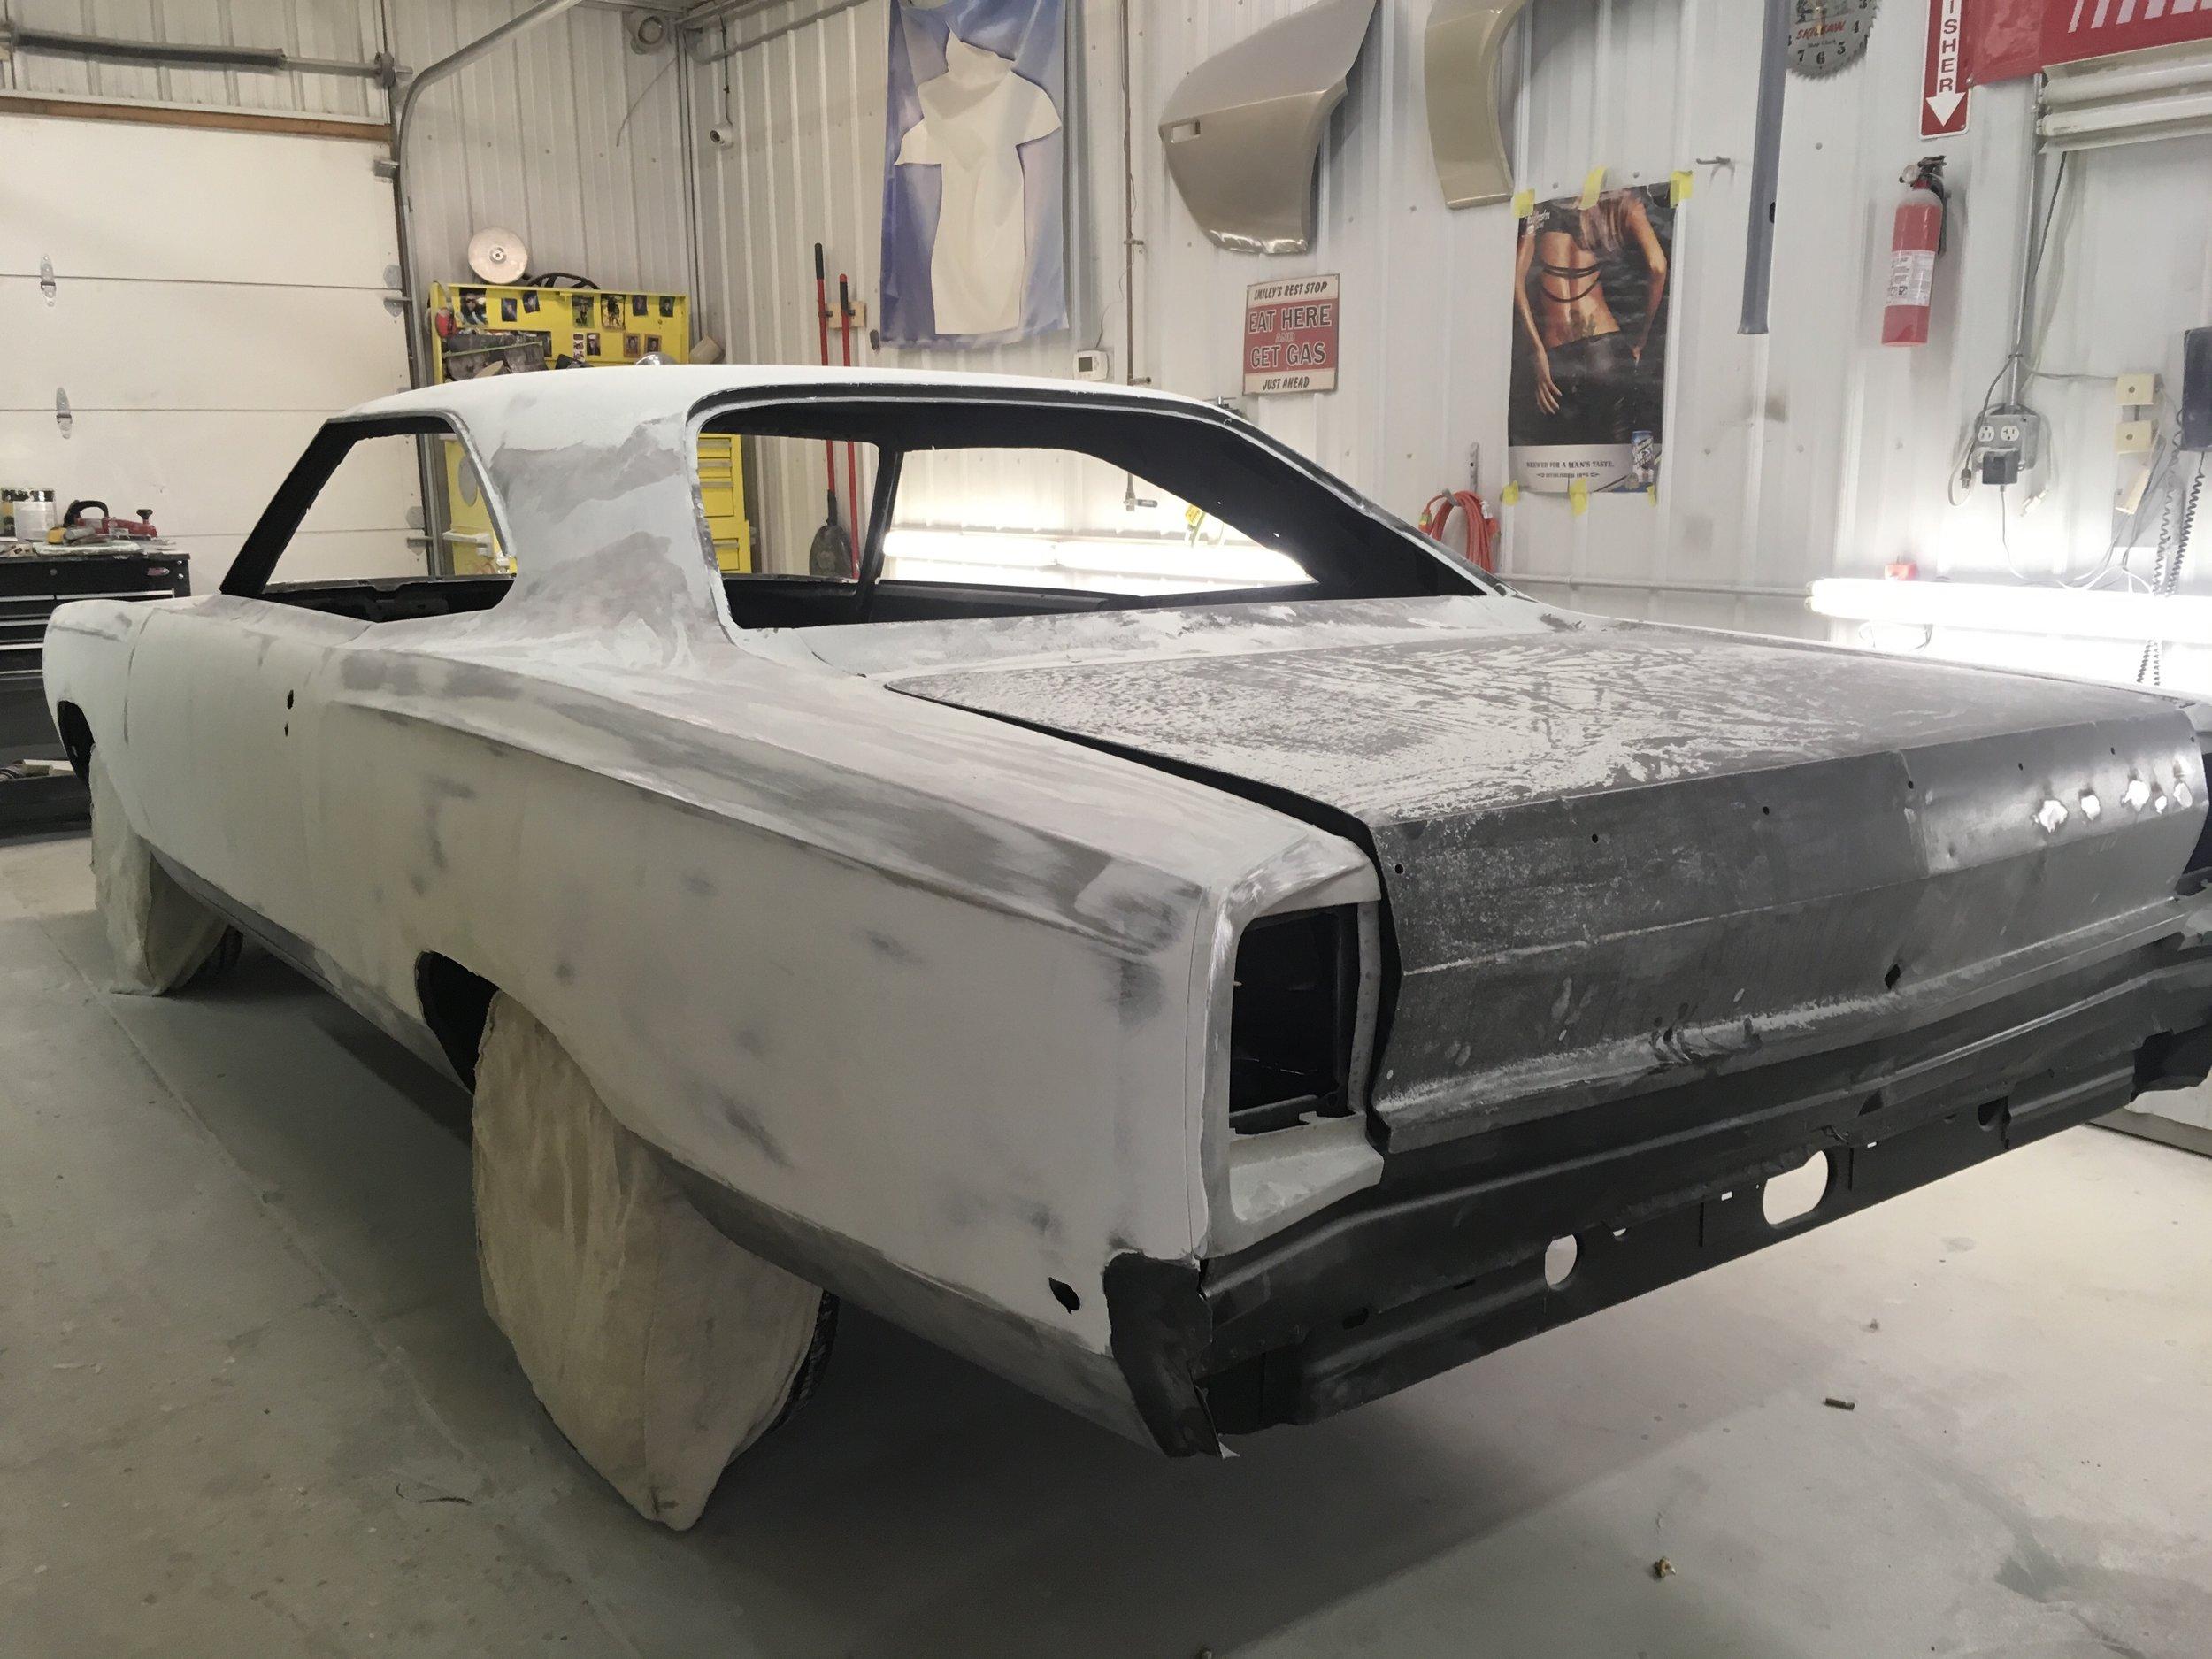 1968-Plymouth-GTX-minneapolis-custom-built-hot-rod-restoration-metal-work.jpg